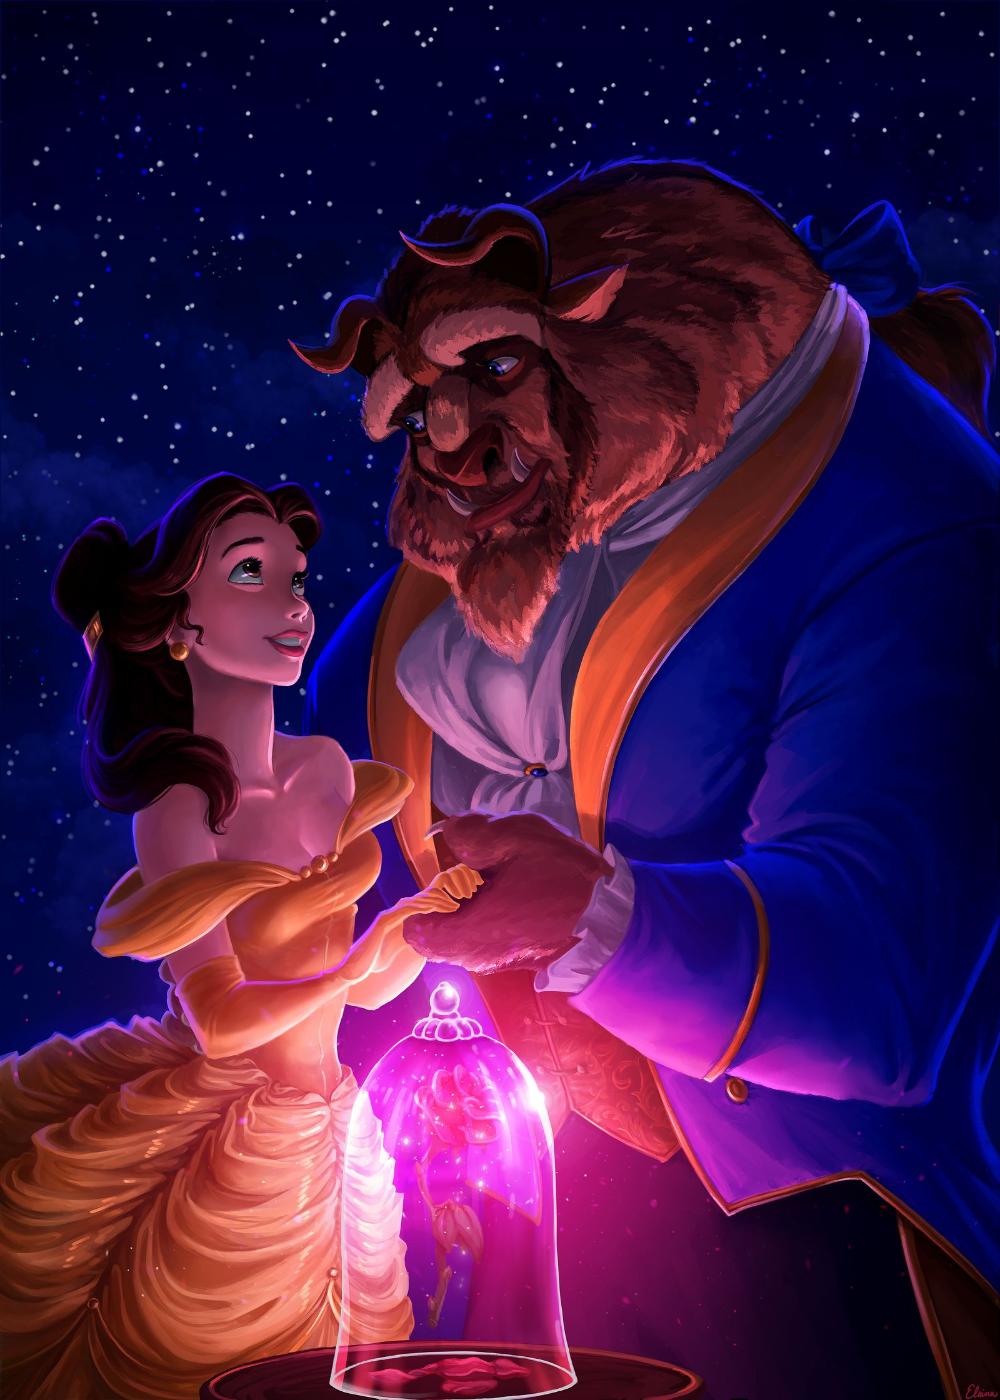 Beauty and the Beast by elaina-f on DeviantArt